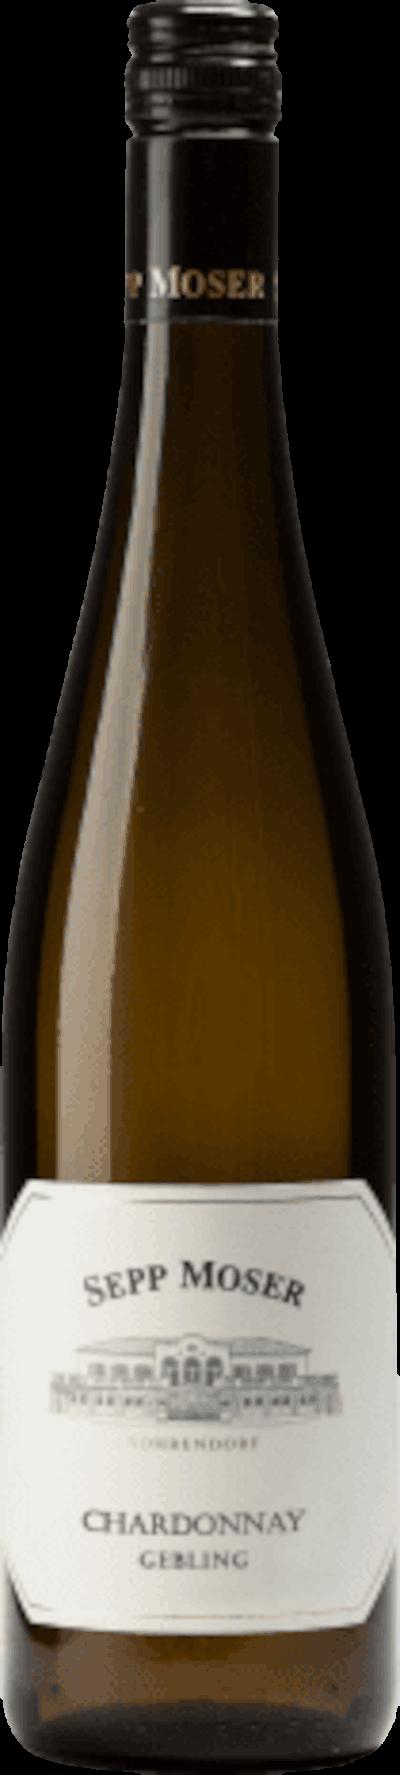 Sepp Moser - Chardonnay Gebling bio